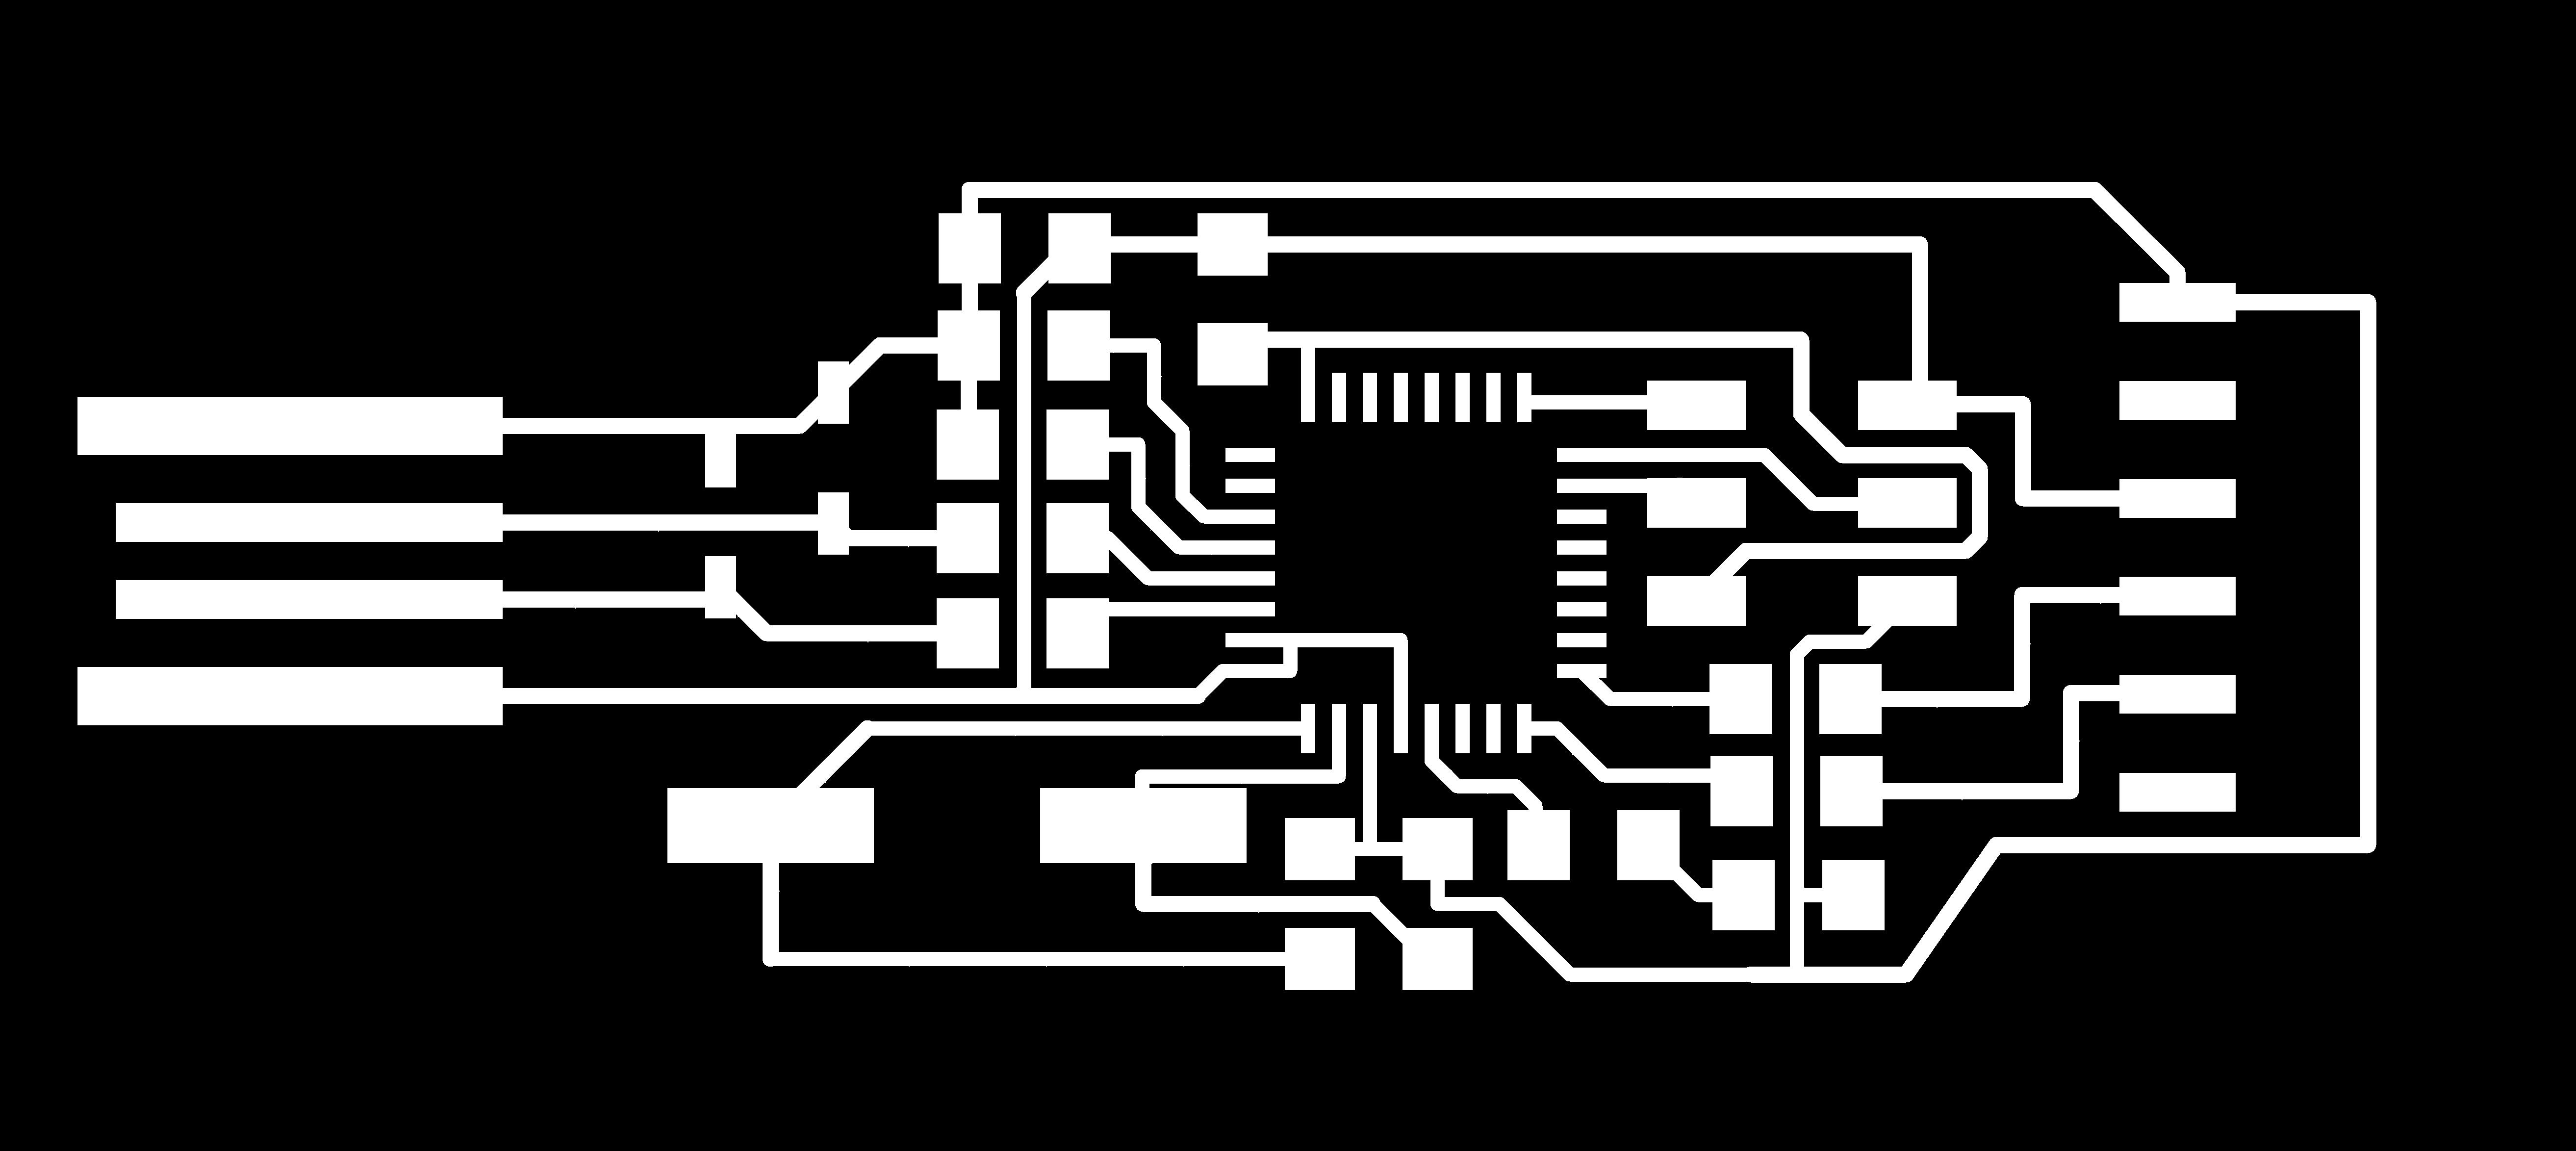 FabFTDI Atmega16U2/FabFTDI_package/FabFTDI_Trace.png